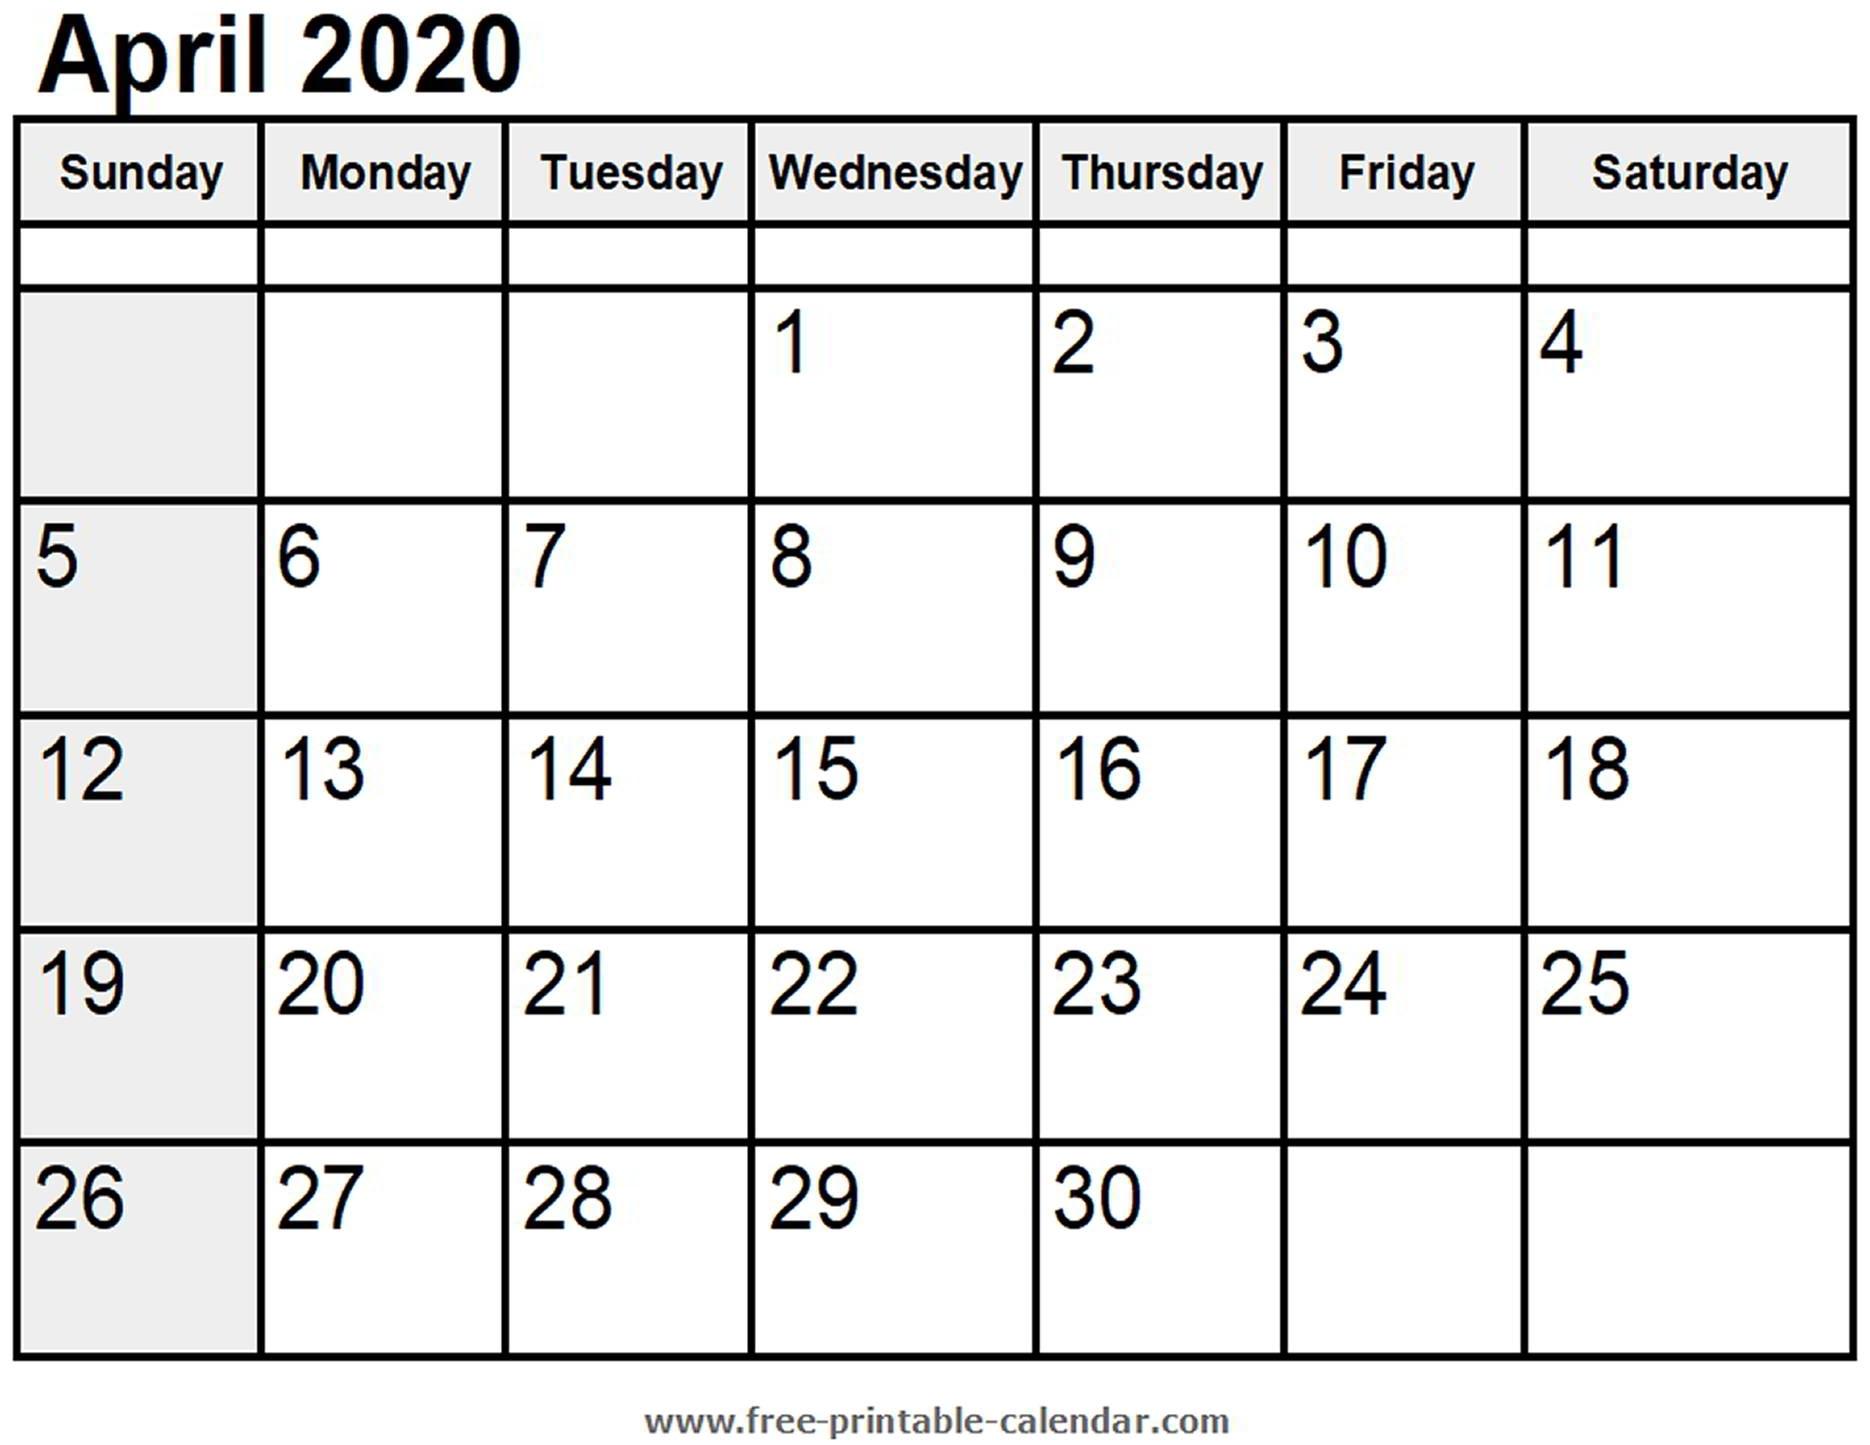 Calendar April 2020 - Free-Printable-Calendar